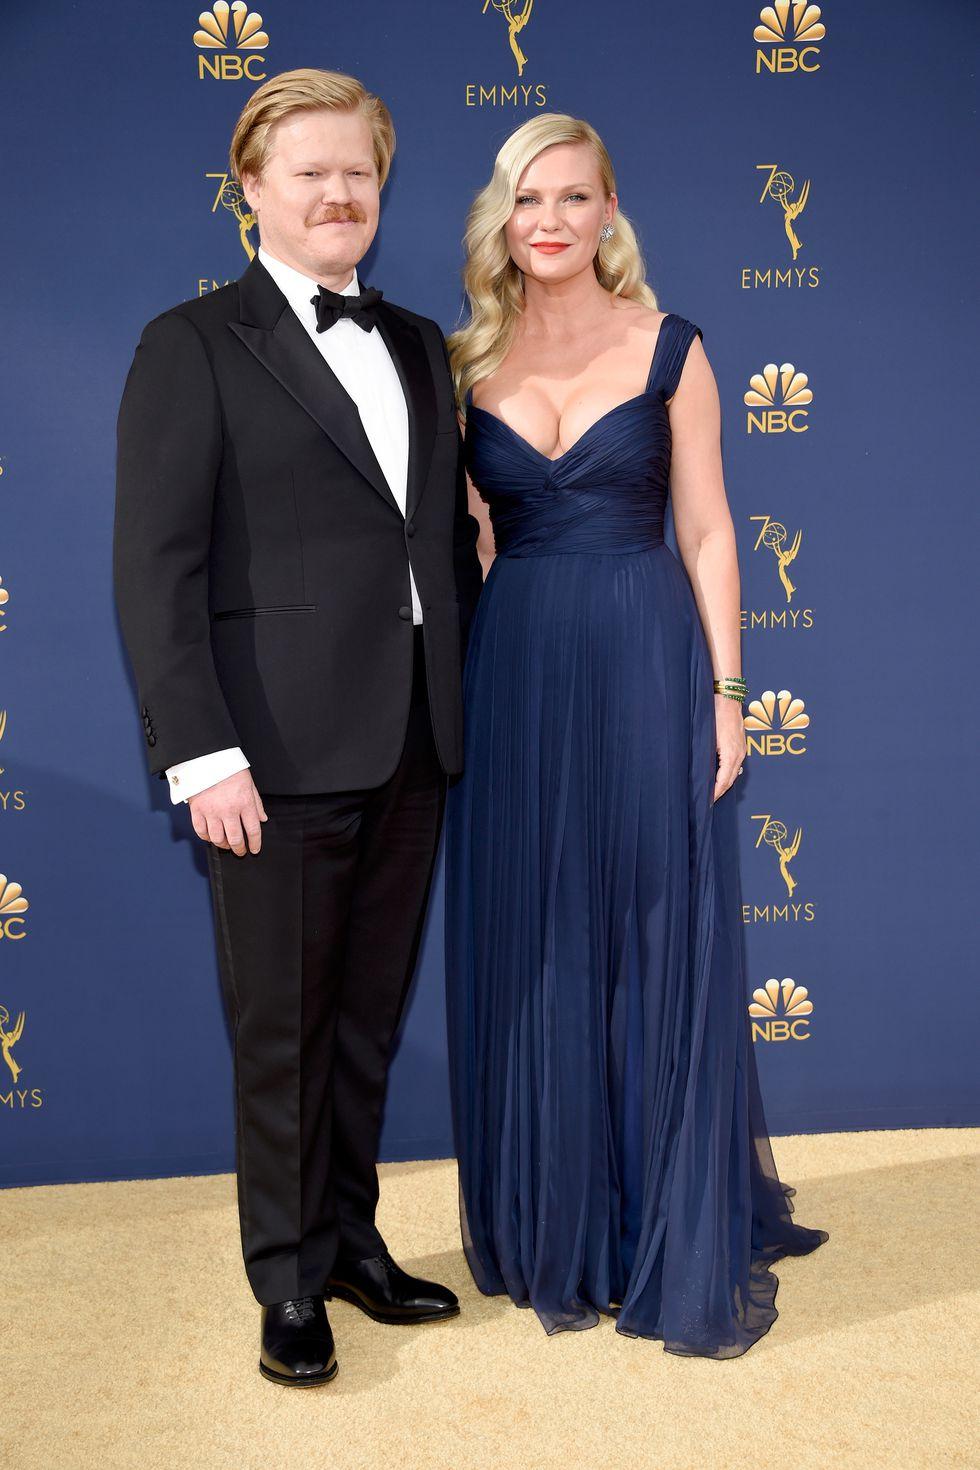 Jesse Plemons and Kirsten Dunst